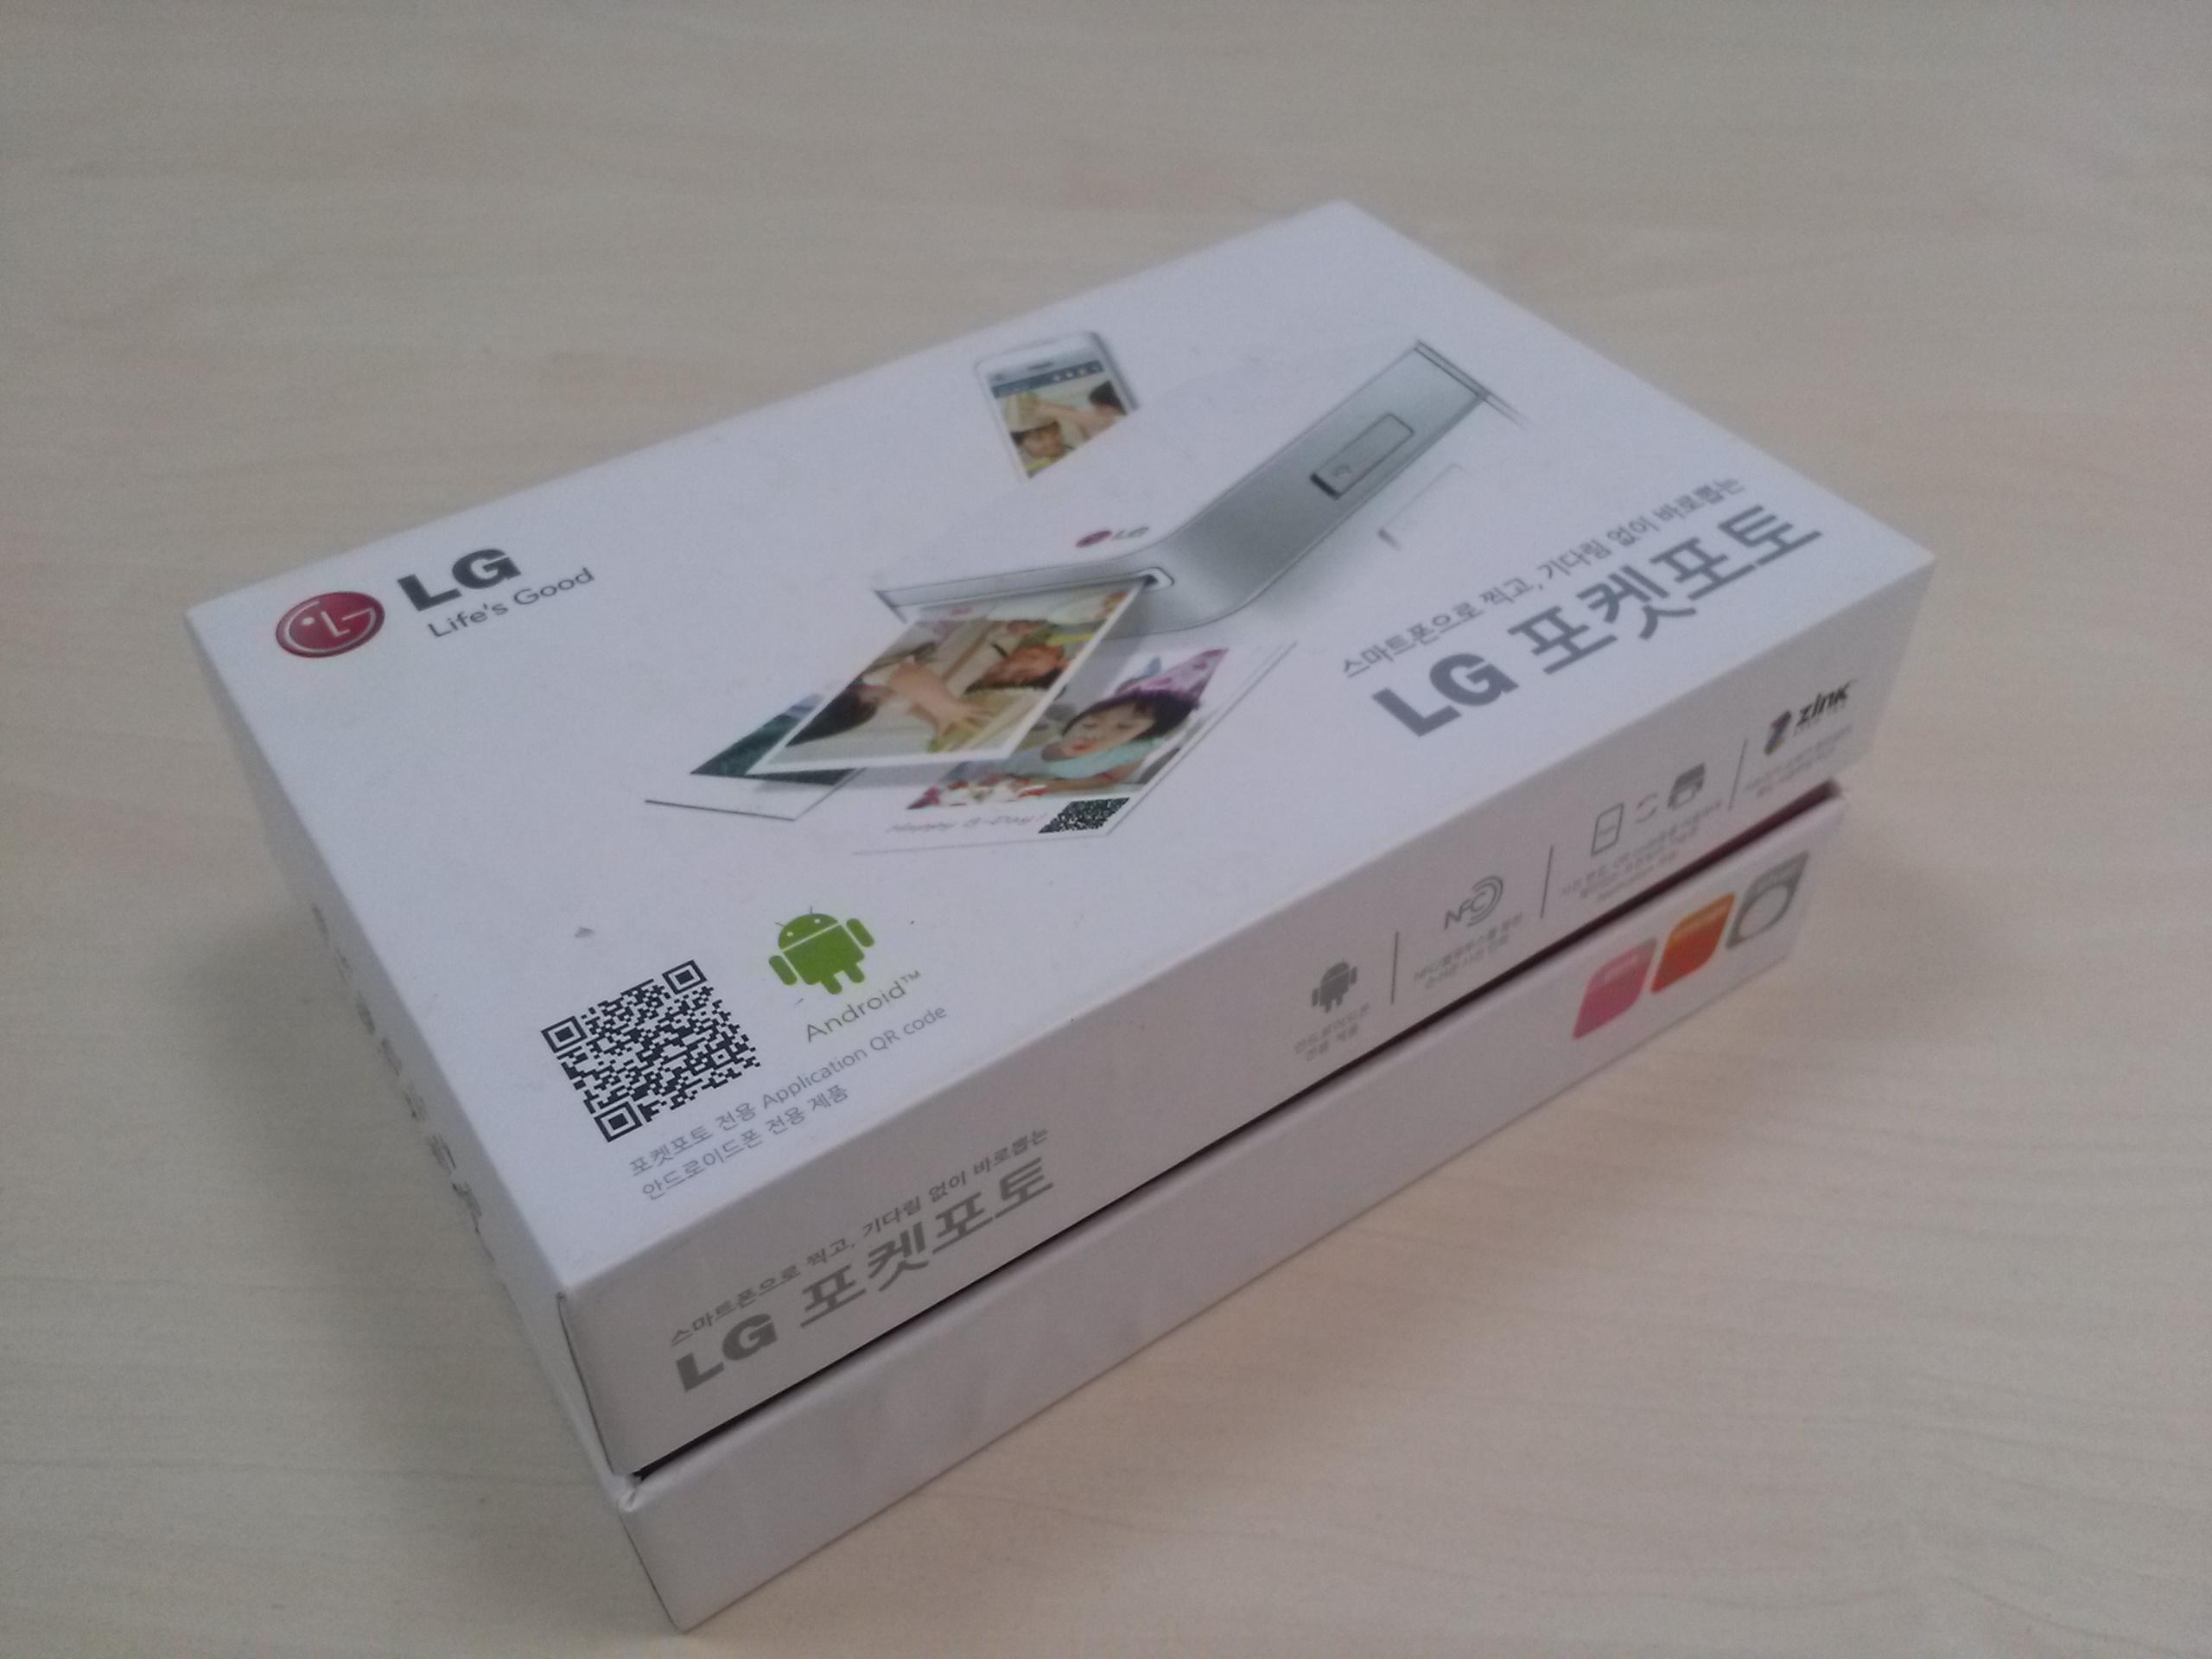 LG Pocket Photo PD223